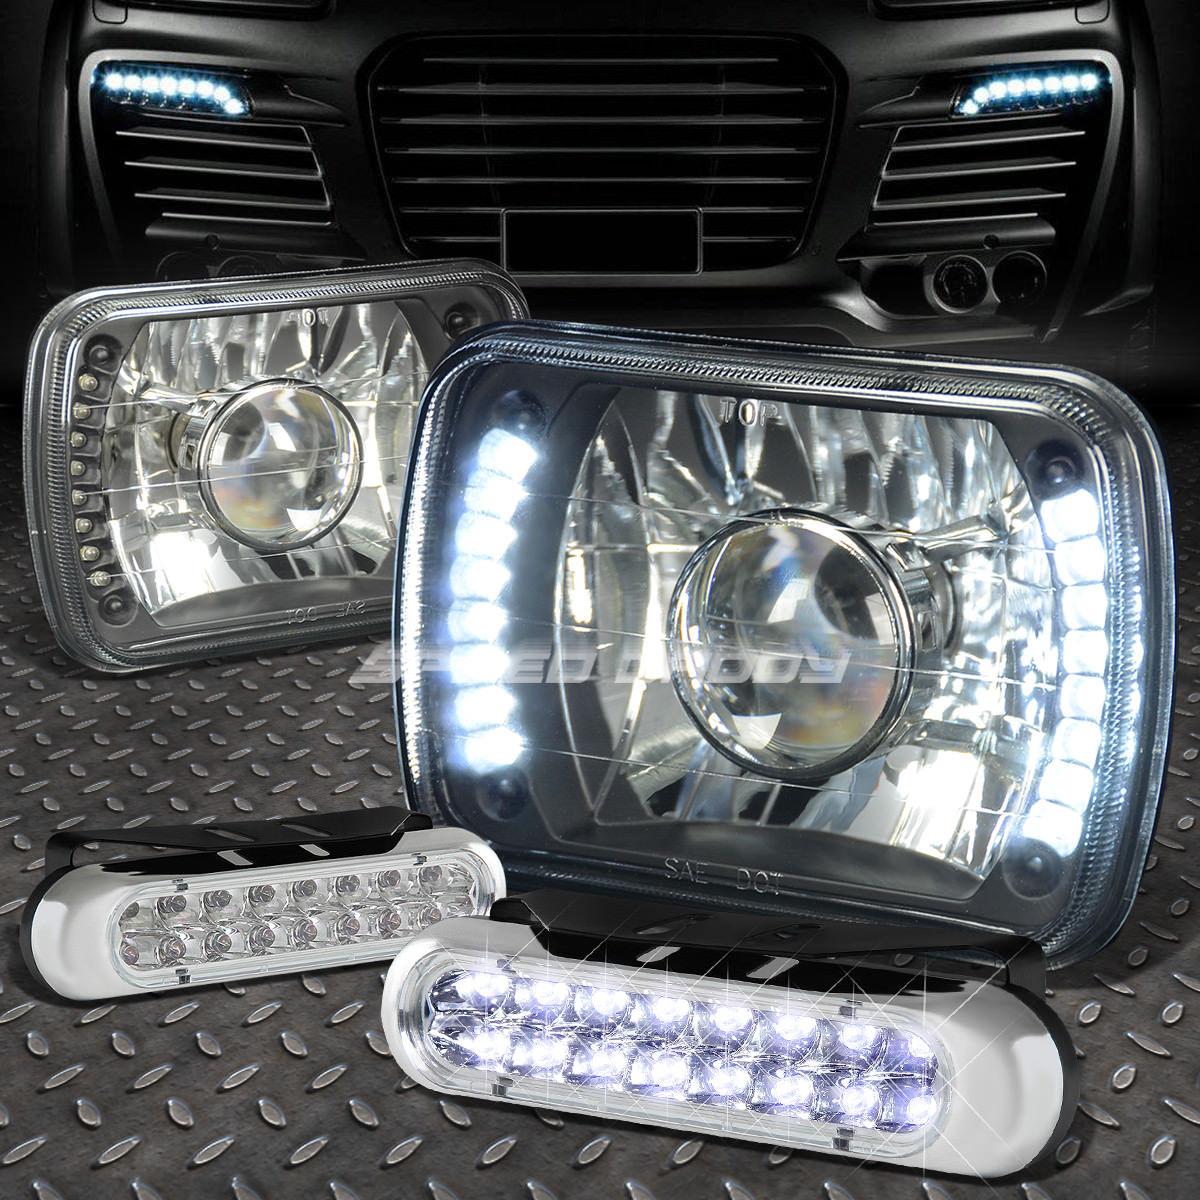 USフォグライト USフォグライト SQUARE BLACK PROJECTOR H6014/H6054 LED HEADLIGHT+16 GRILL LED GRILL FOG LIGHT FOR H6014/H6054 スクエアブラックプロジェクターLEDヘッドライト+ H6014/ H6054用16 LEDグリルフォグライト, 照本食肉加工所:da1010a0 --- diadrasis.net